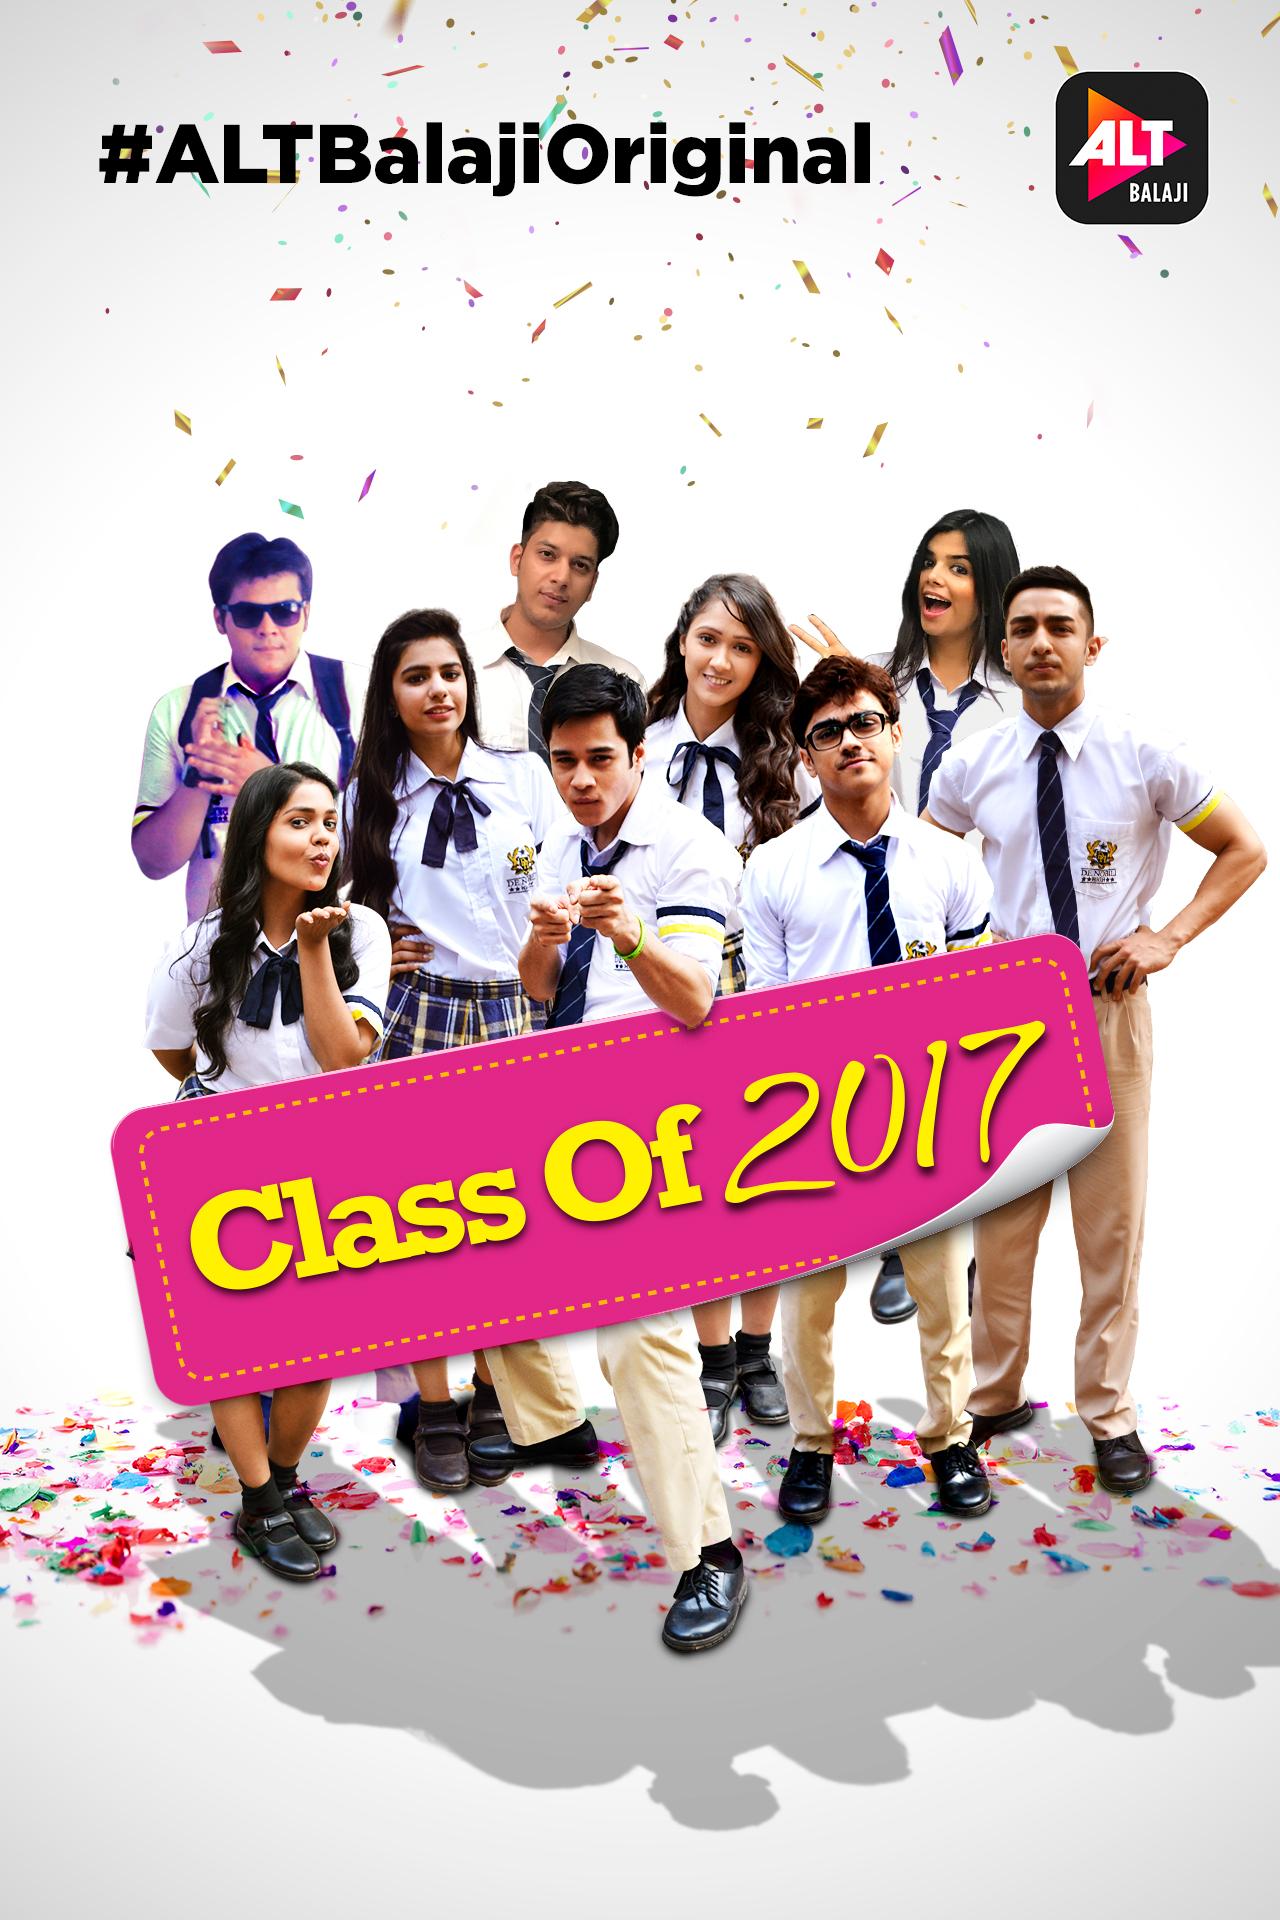 Class Of 2017 S01 1080p WEB-DL HEVC